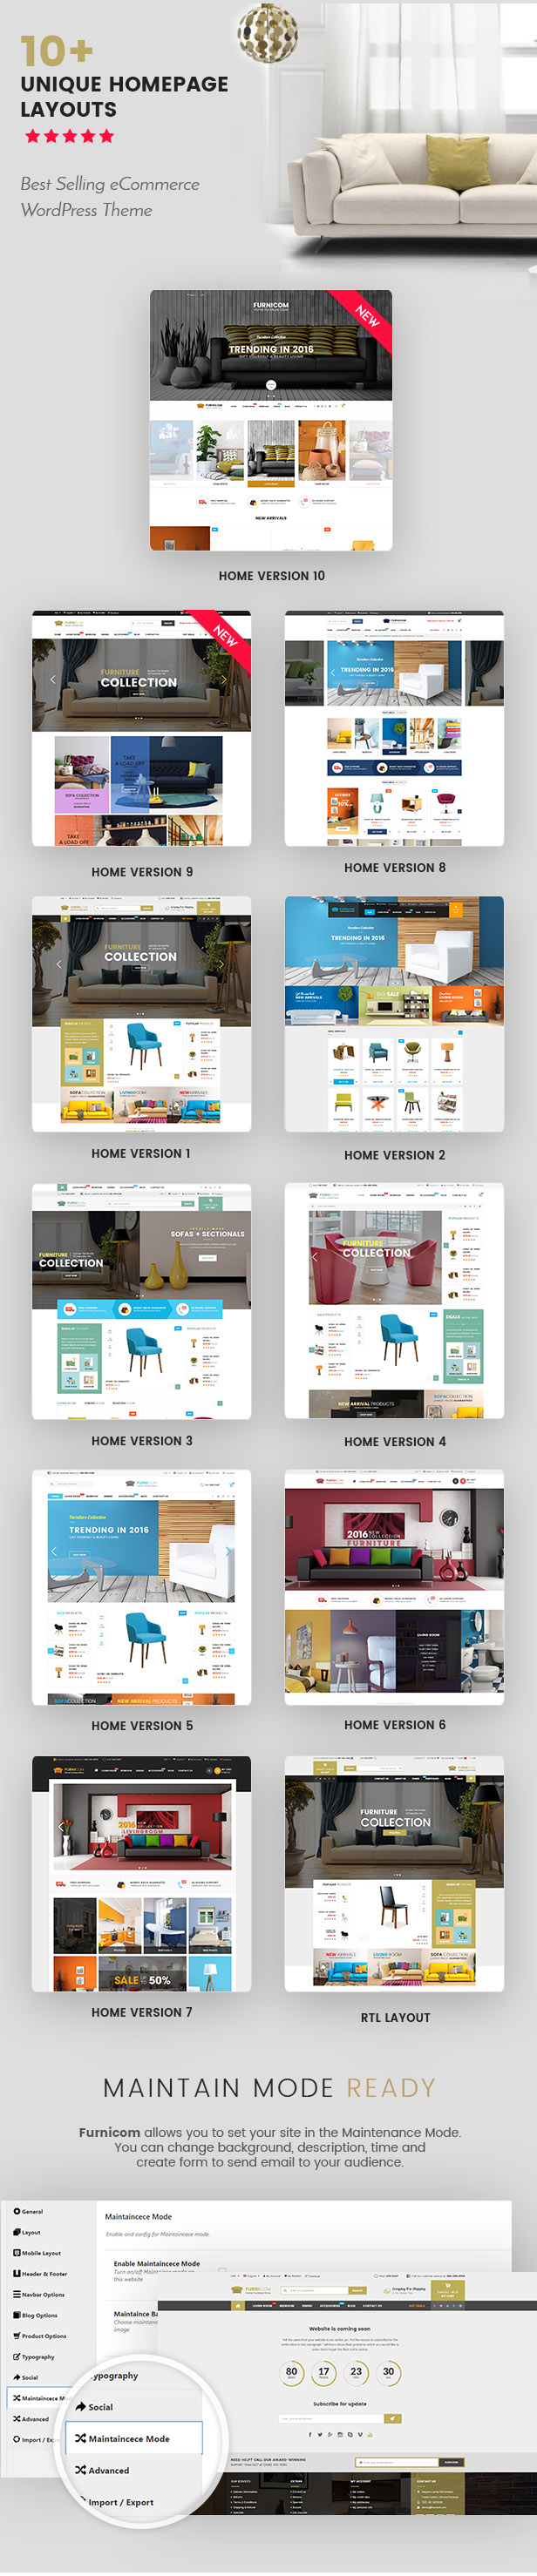 Reaktionsschnelle Möbel WooCommerce WordPress Template - Homepage